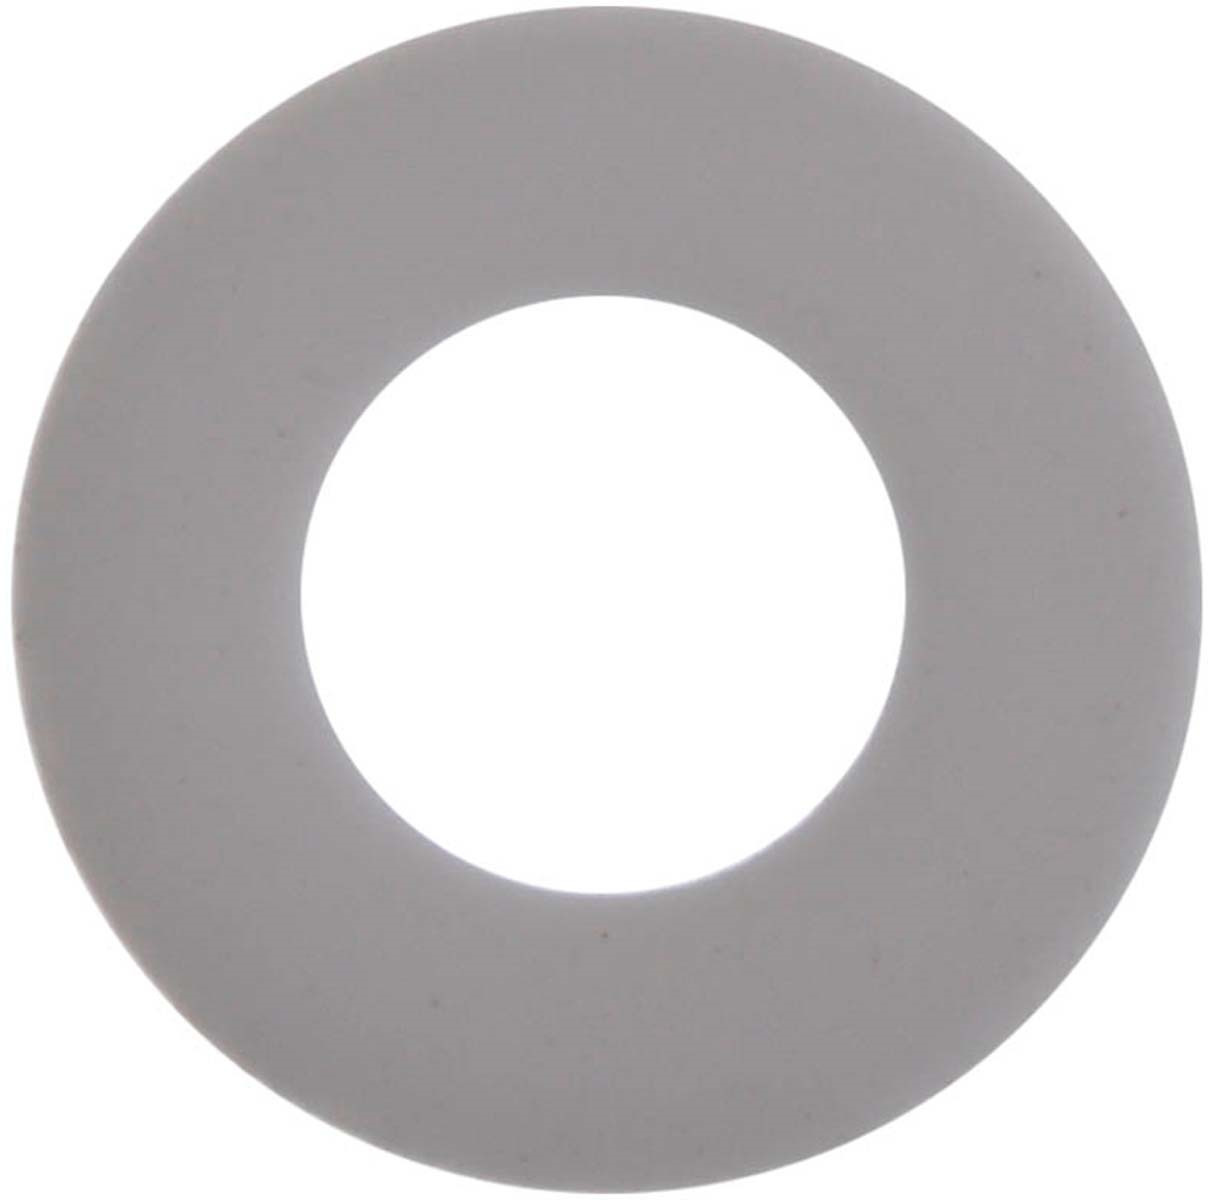 Прокладка из фторопласта MasterProf, 3/4, 100 шт, МР-пакет прокладка силиконовая masterprof 1 2 100 шт mp пакет